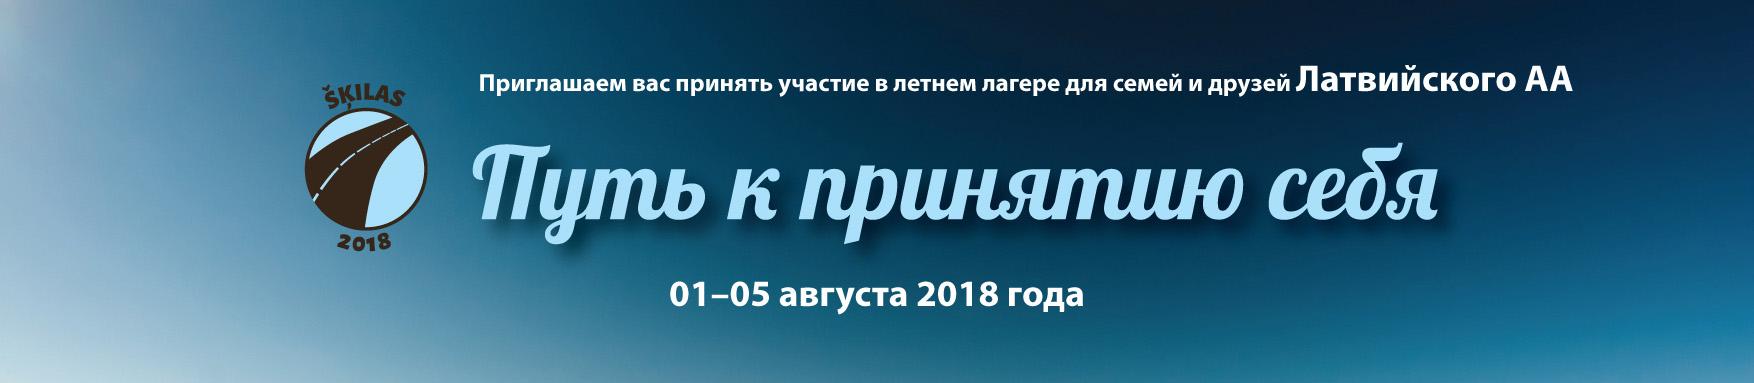 aa_nometne_2018_ru